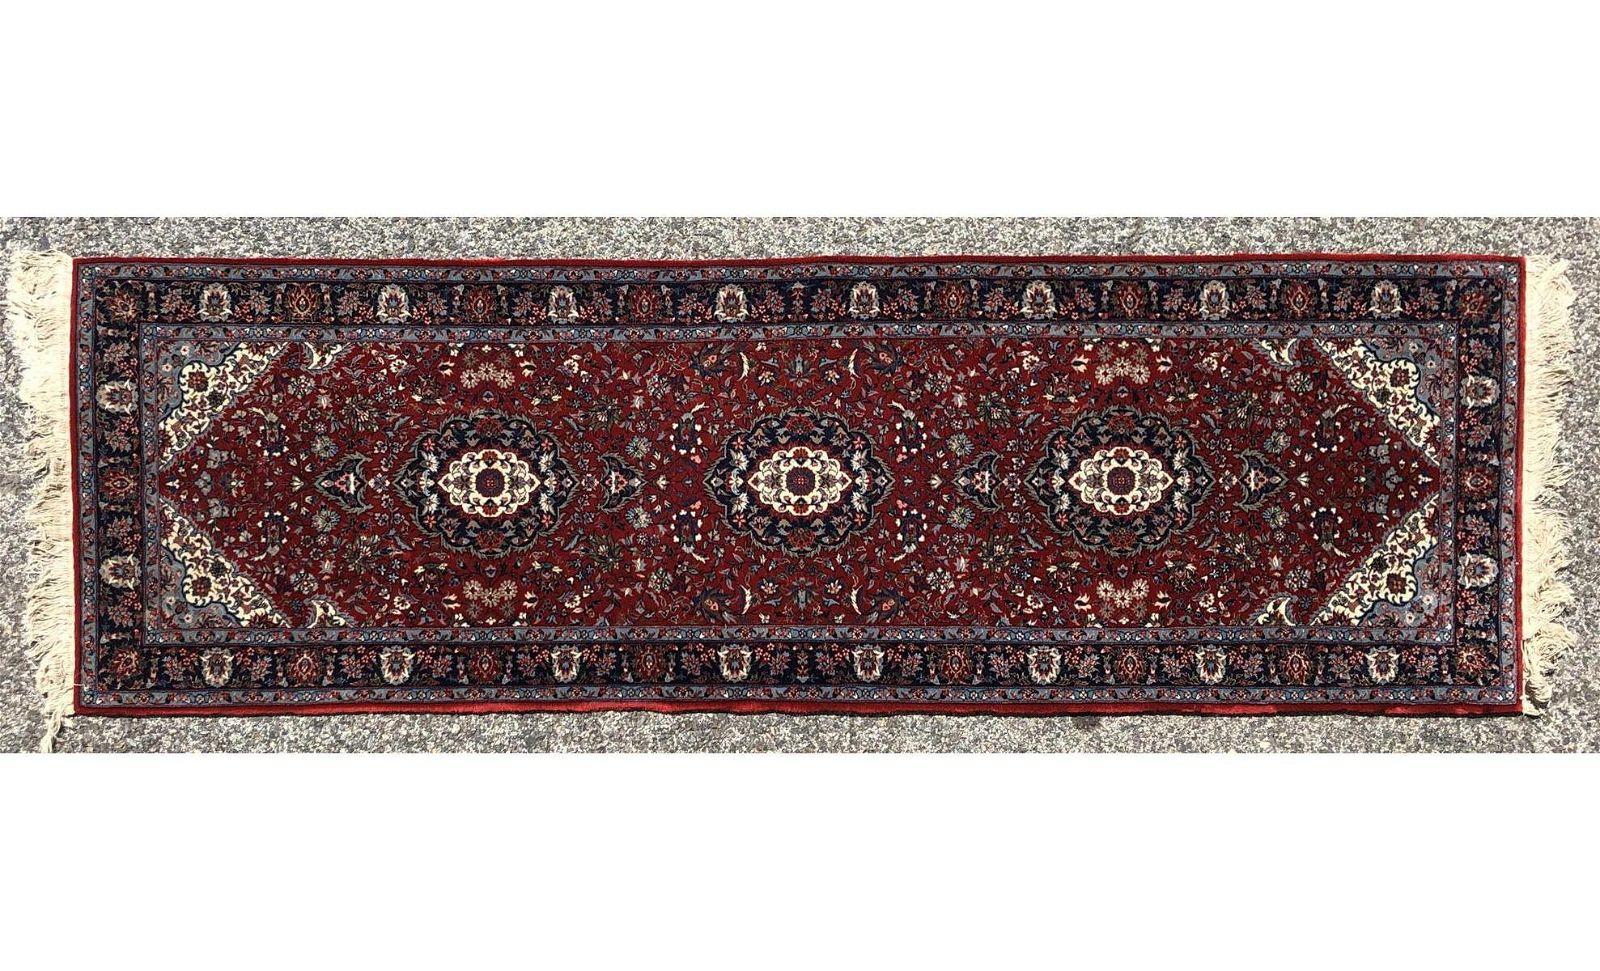 8'2 x 3'2 Handmade Runner Oriental Rug Carpet.  B